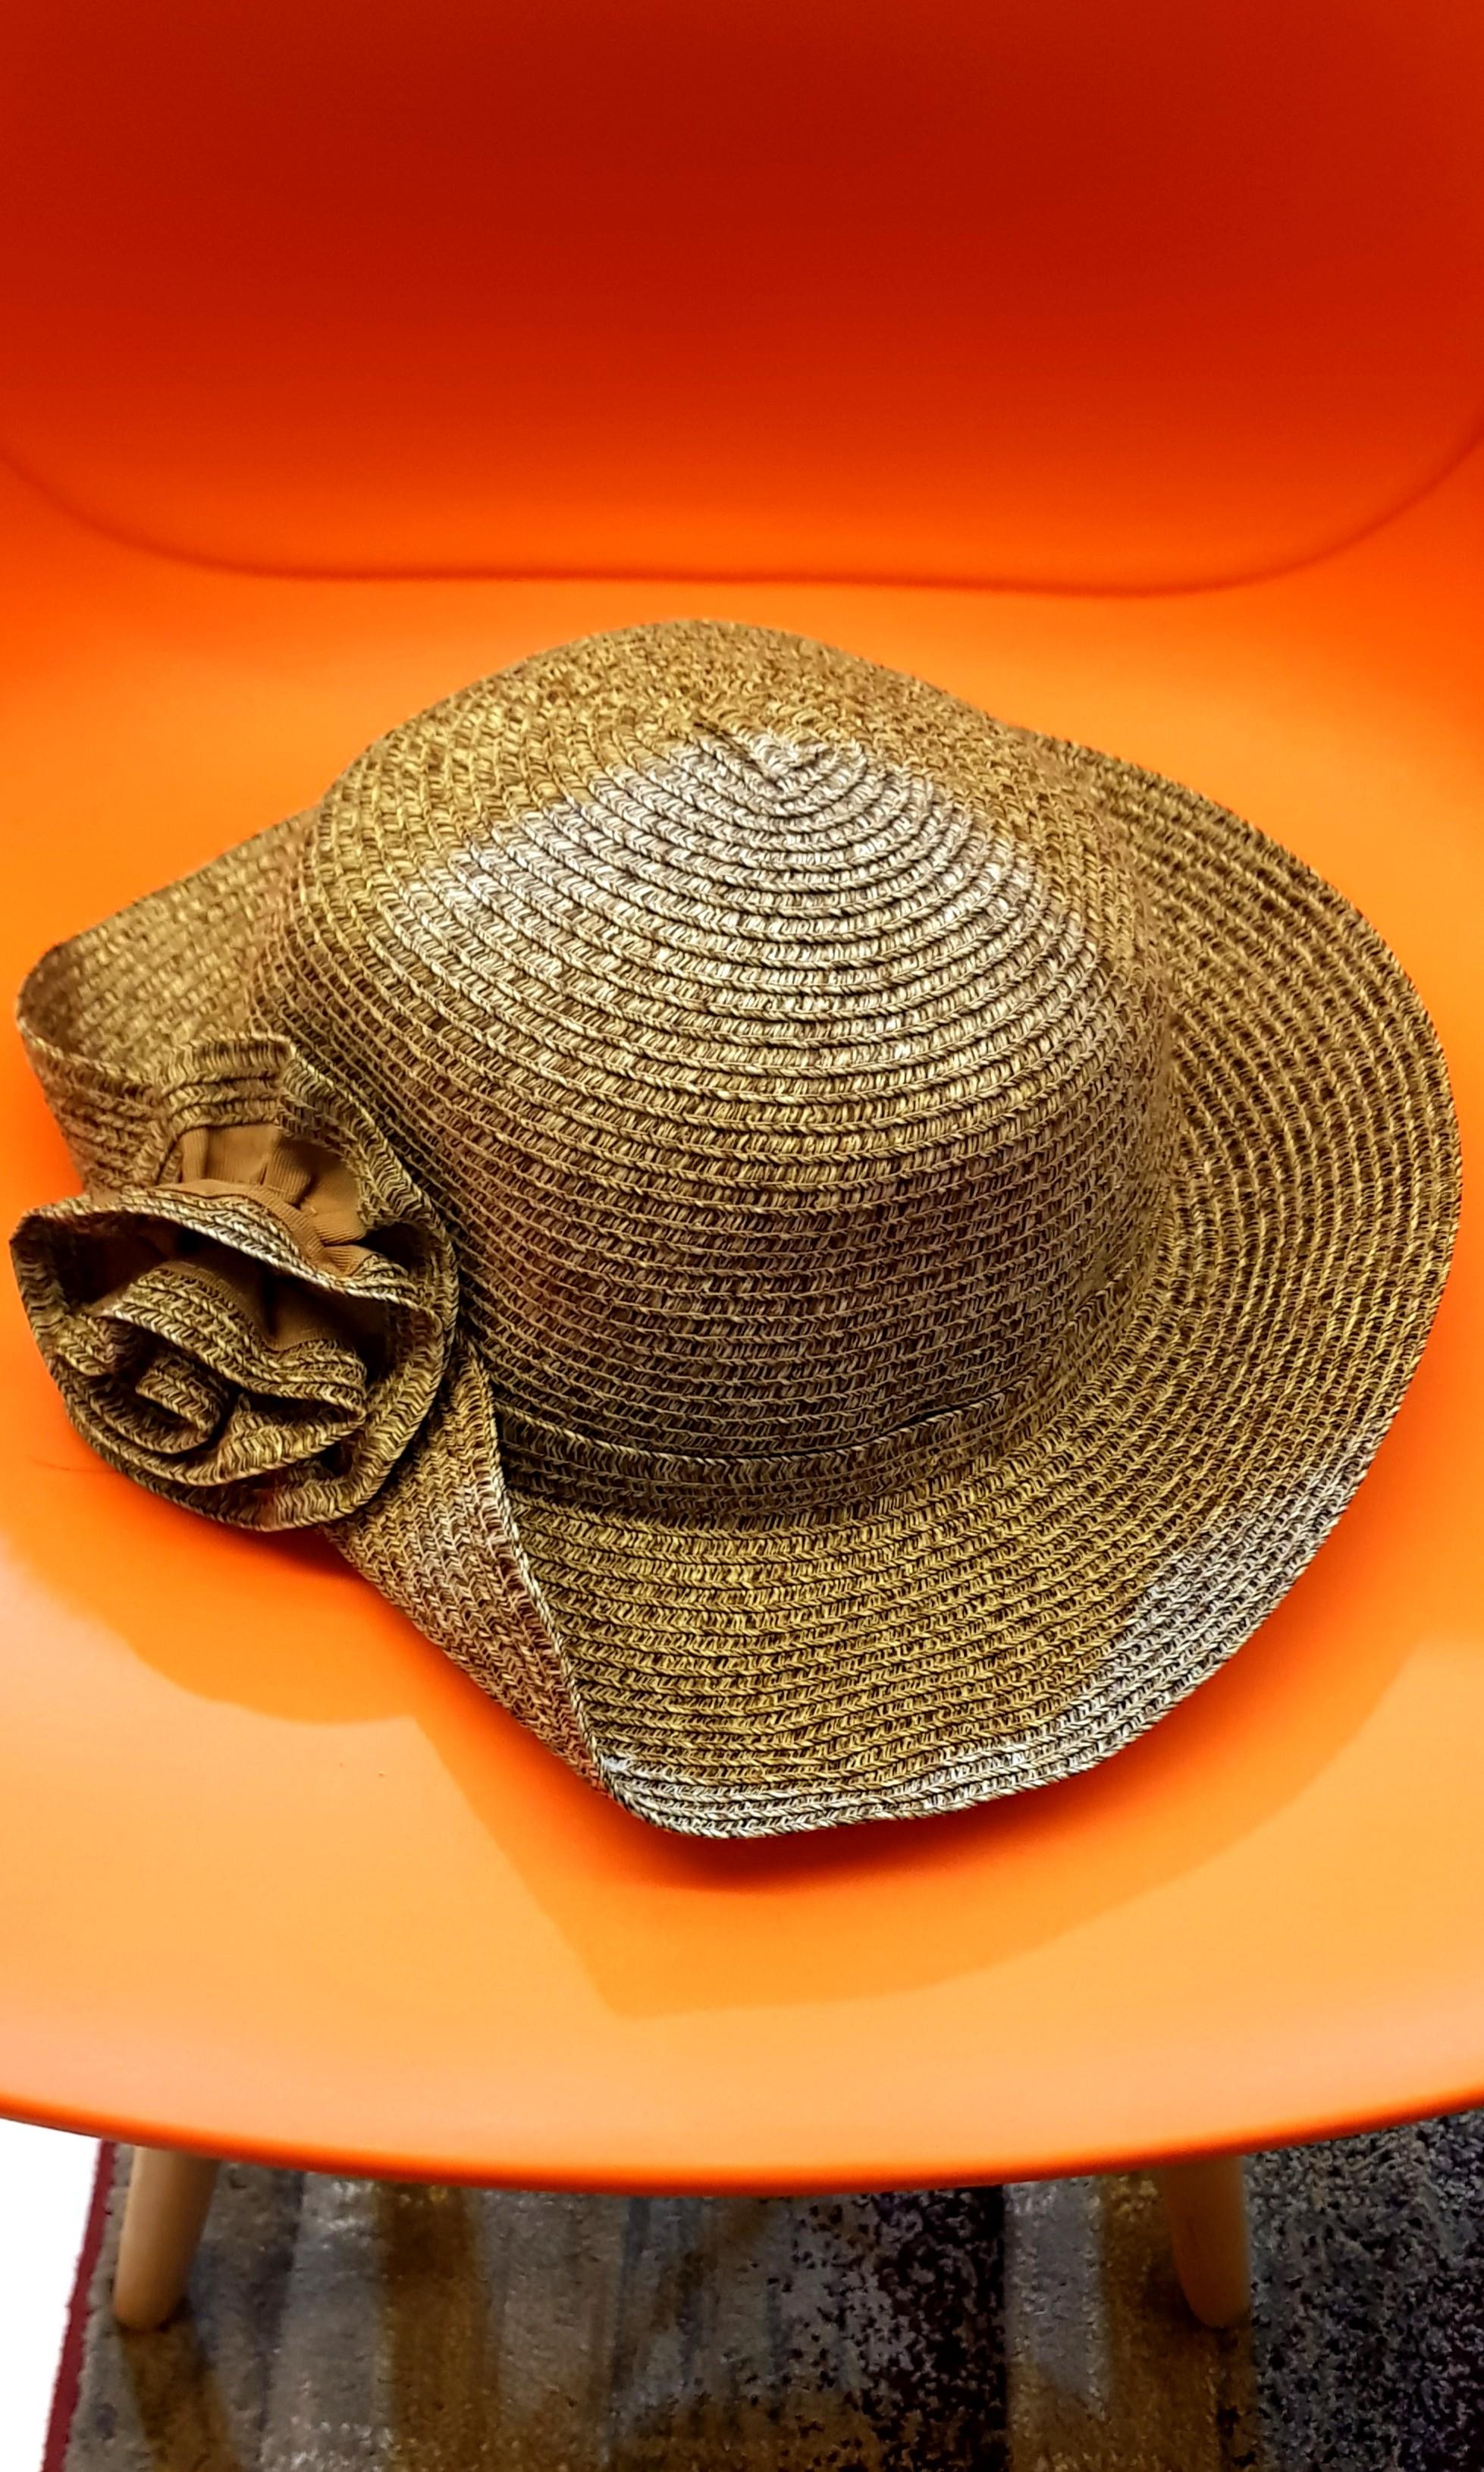 520da094 Brown Korean summer hat bought in Taipei last week - made in Korea ...